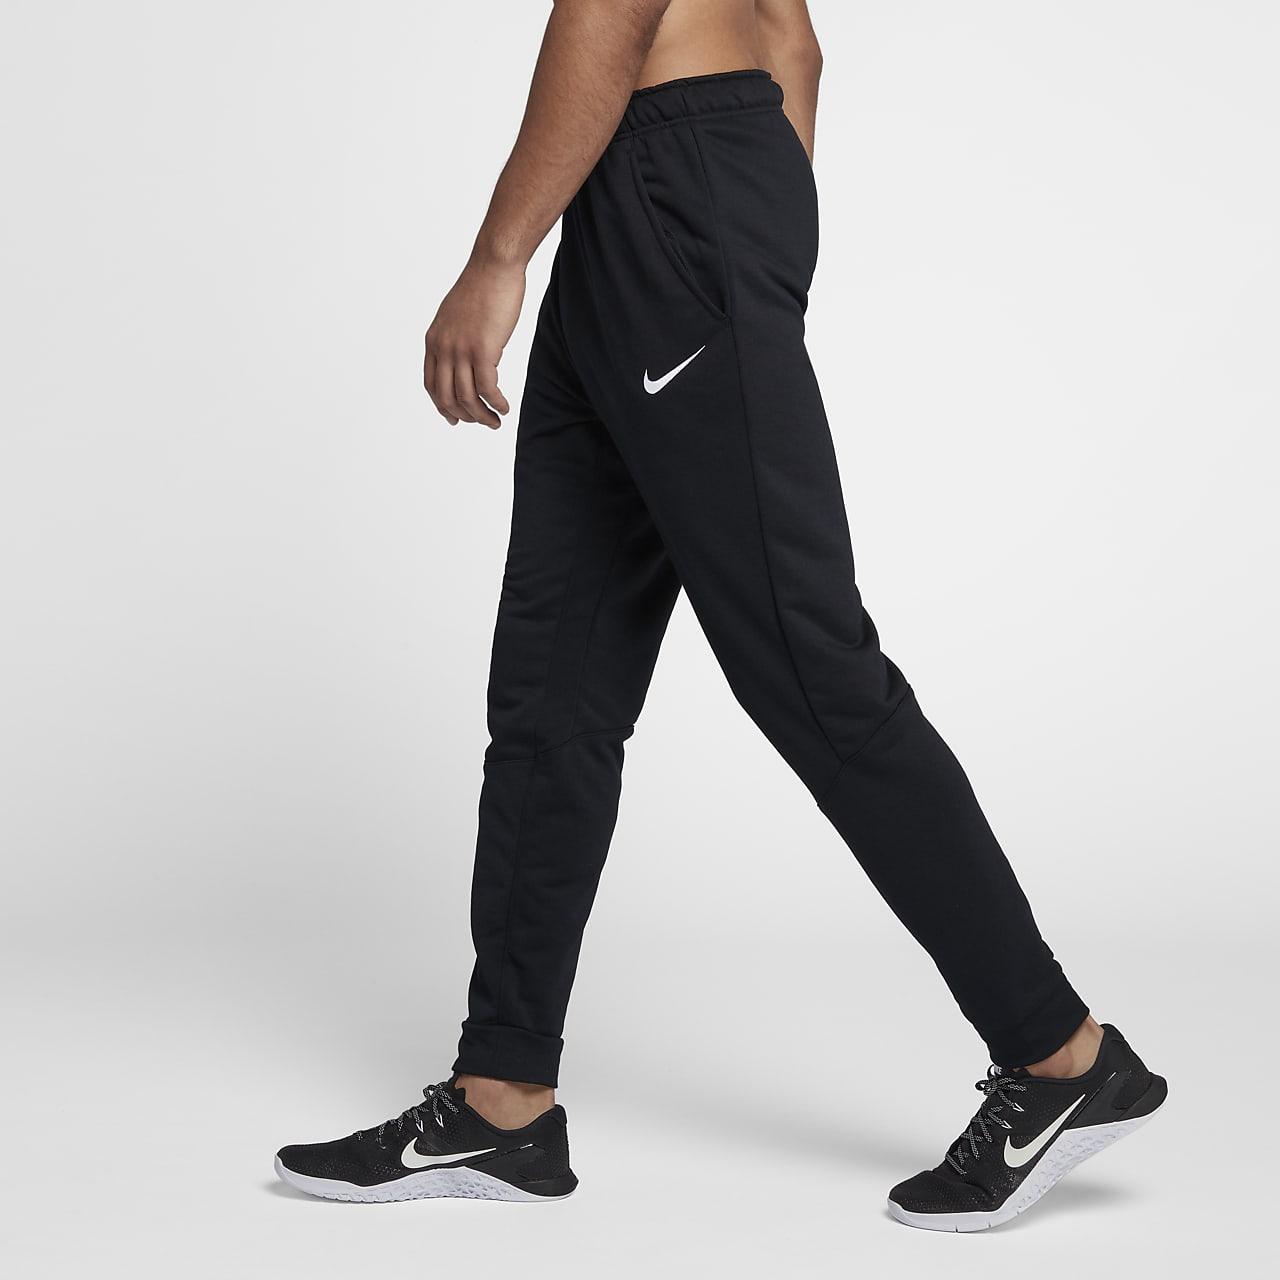 Detener lanzamiento carrera  Nike Dri-FIT Men's Tapered Fleece Training Pants. Nike.com